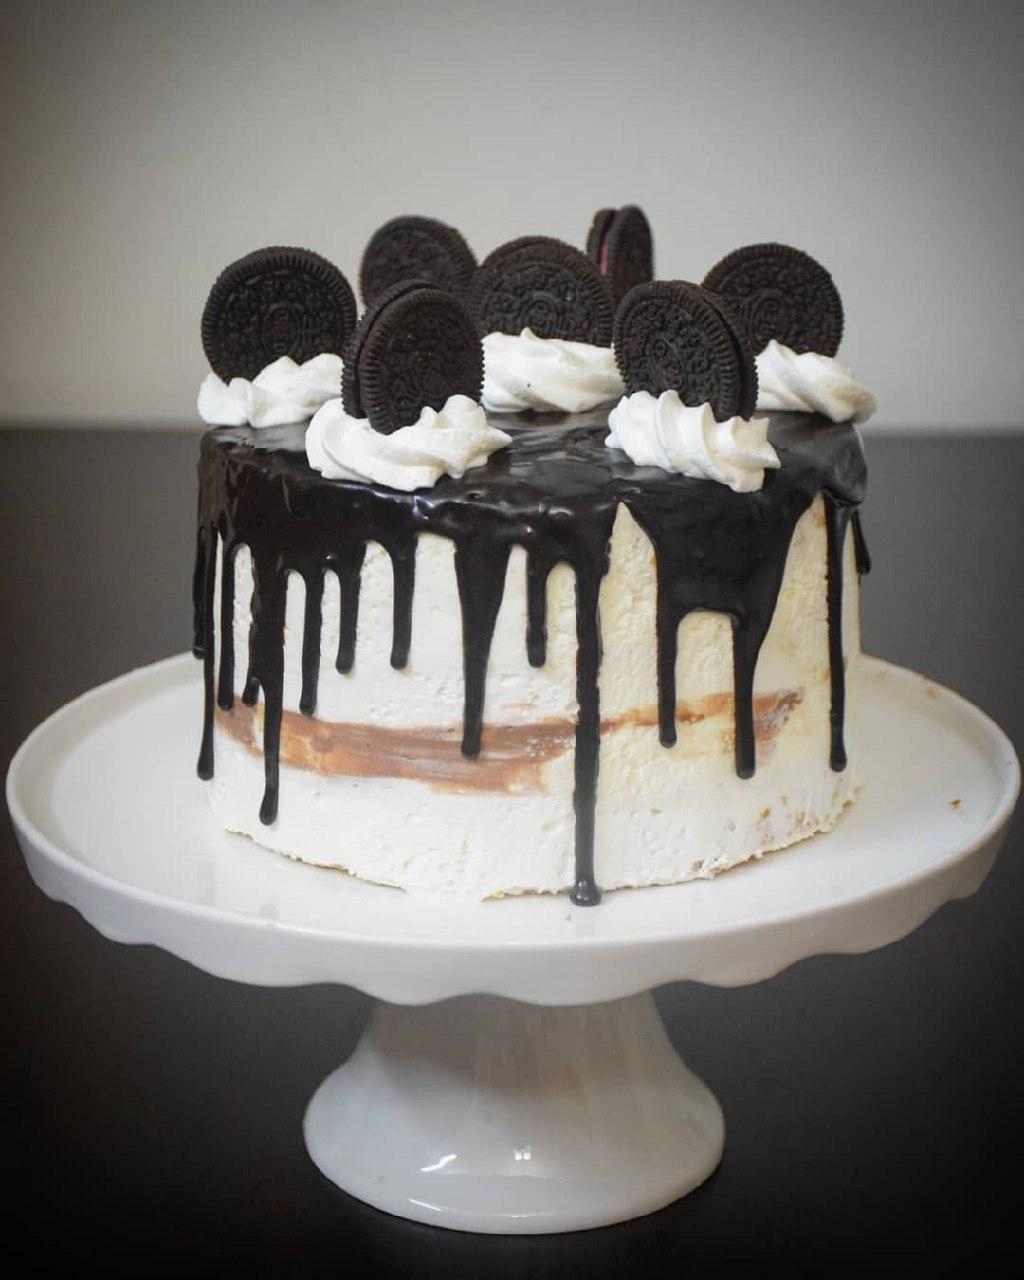 دریپ کیک۲